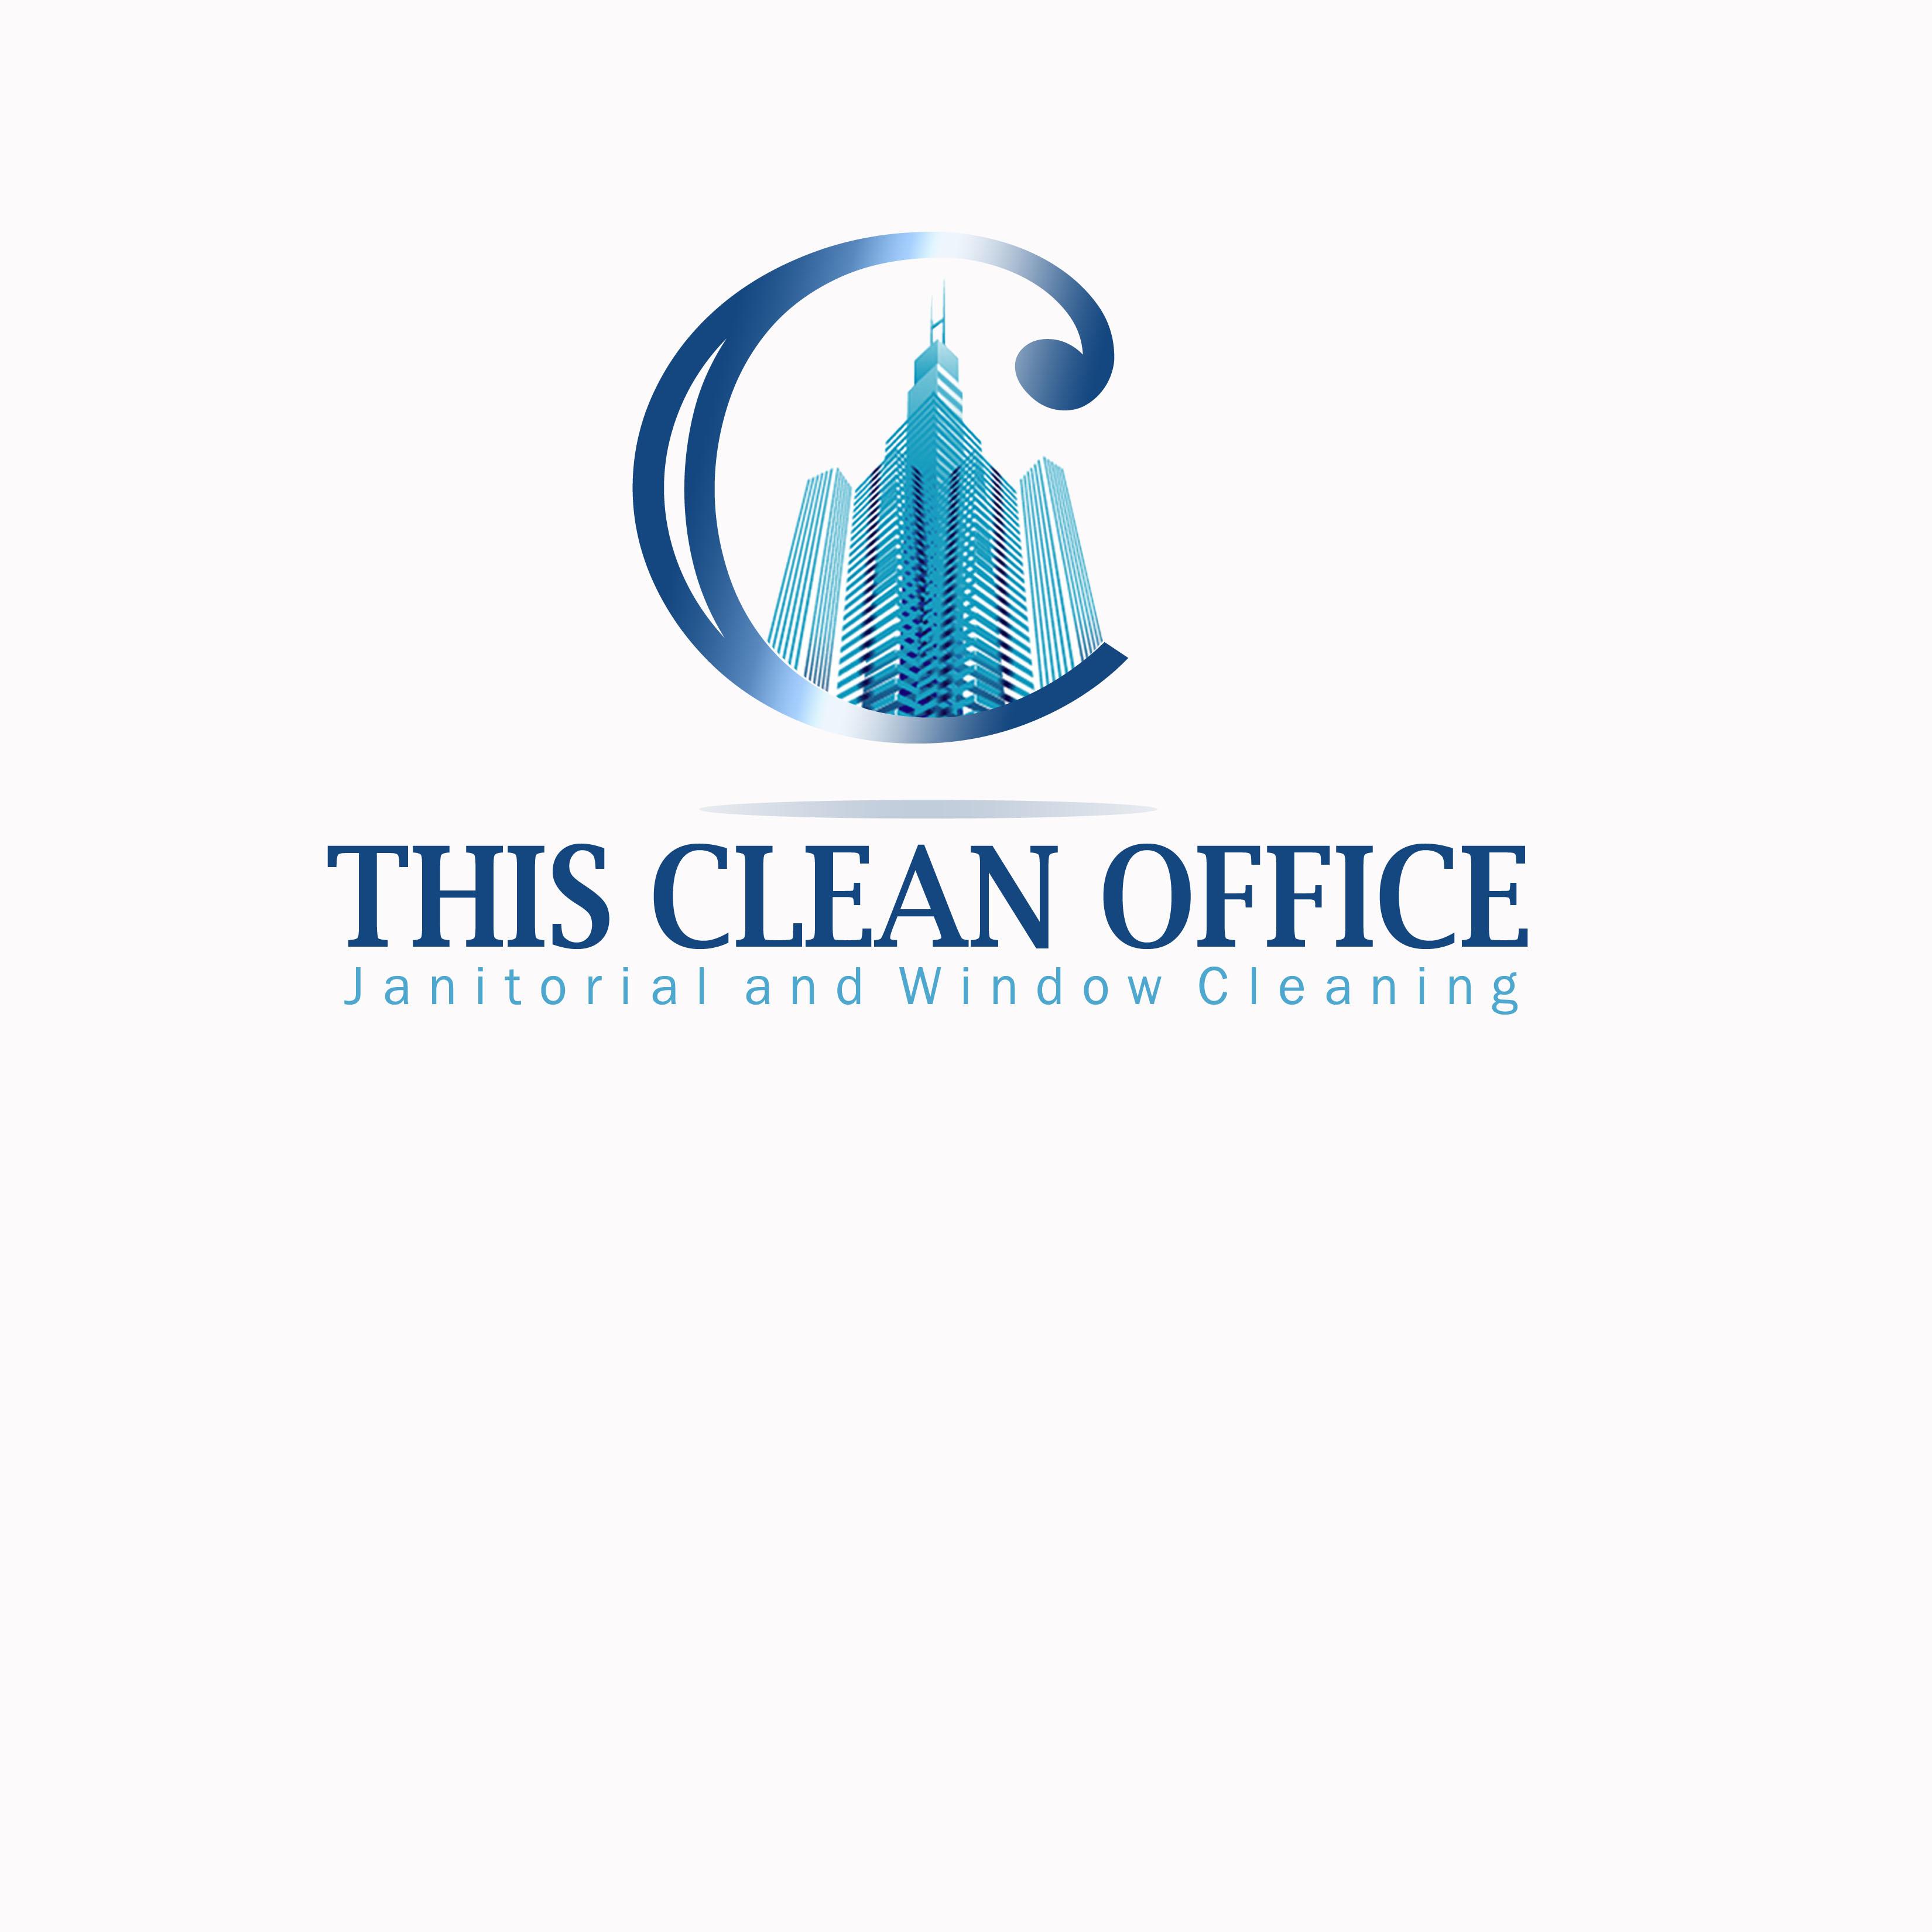 Logo Design Contests Professional and Unfor table Logo Design